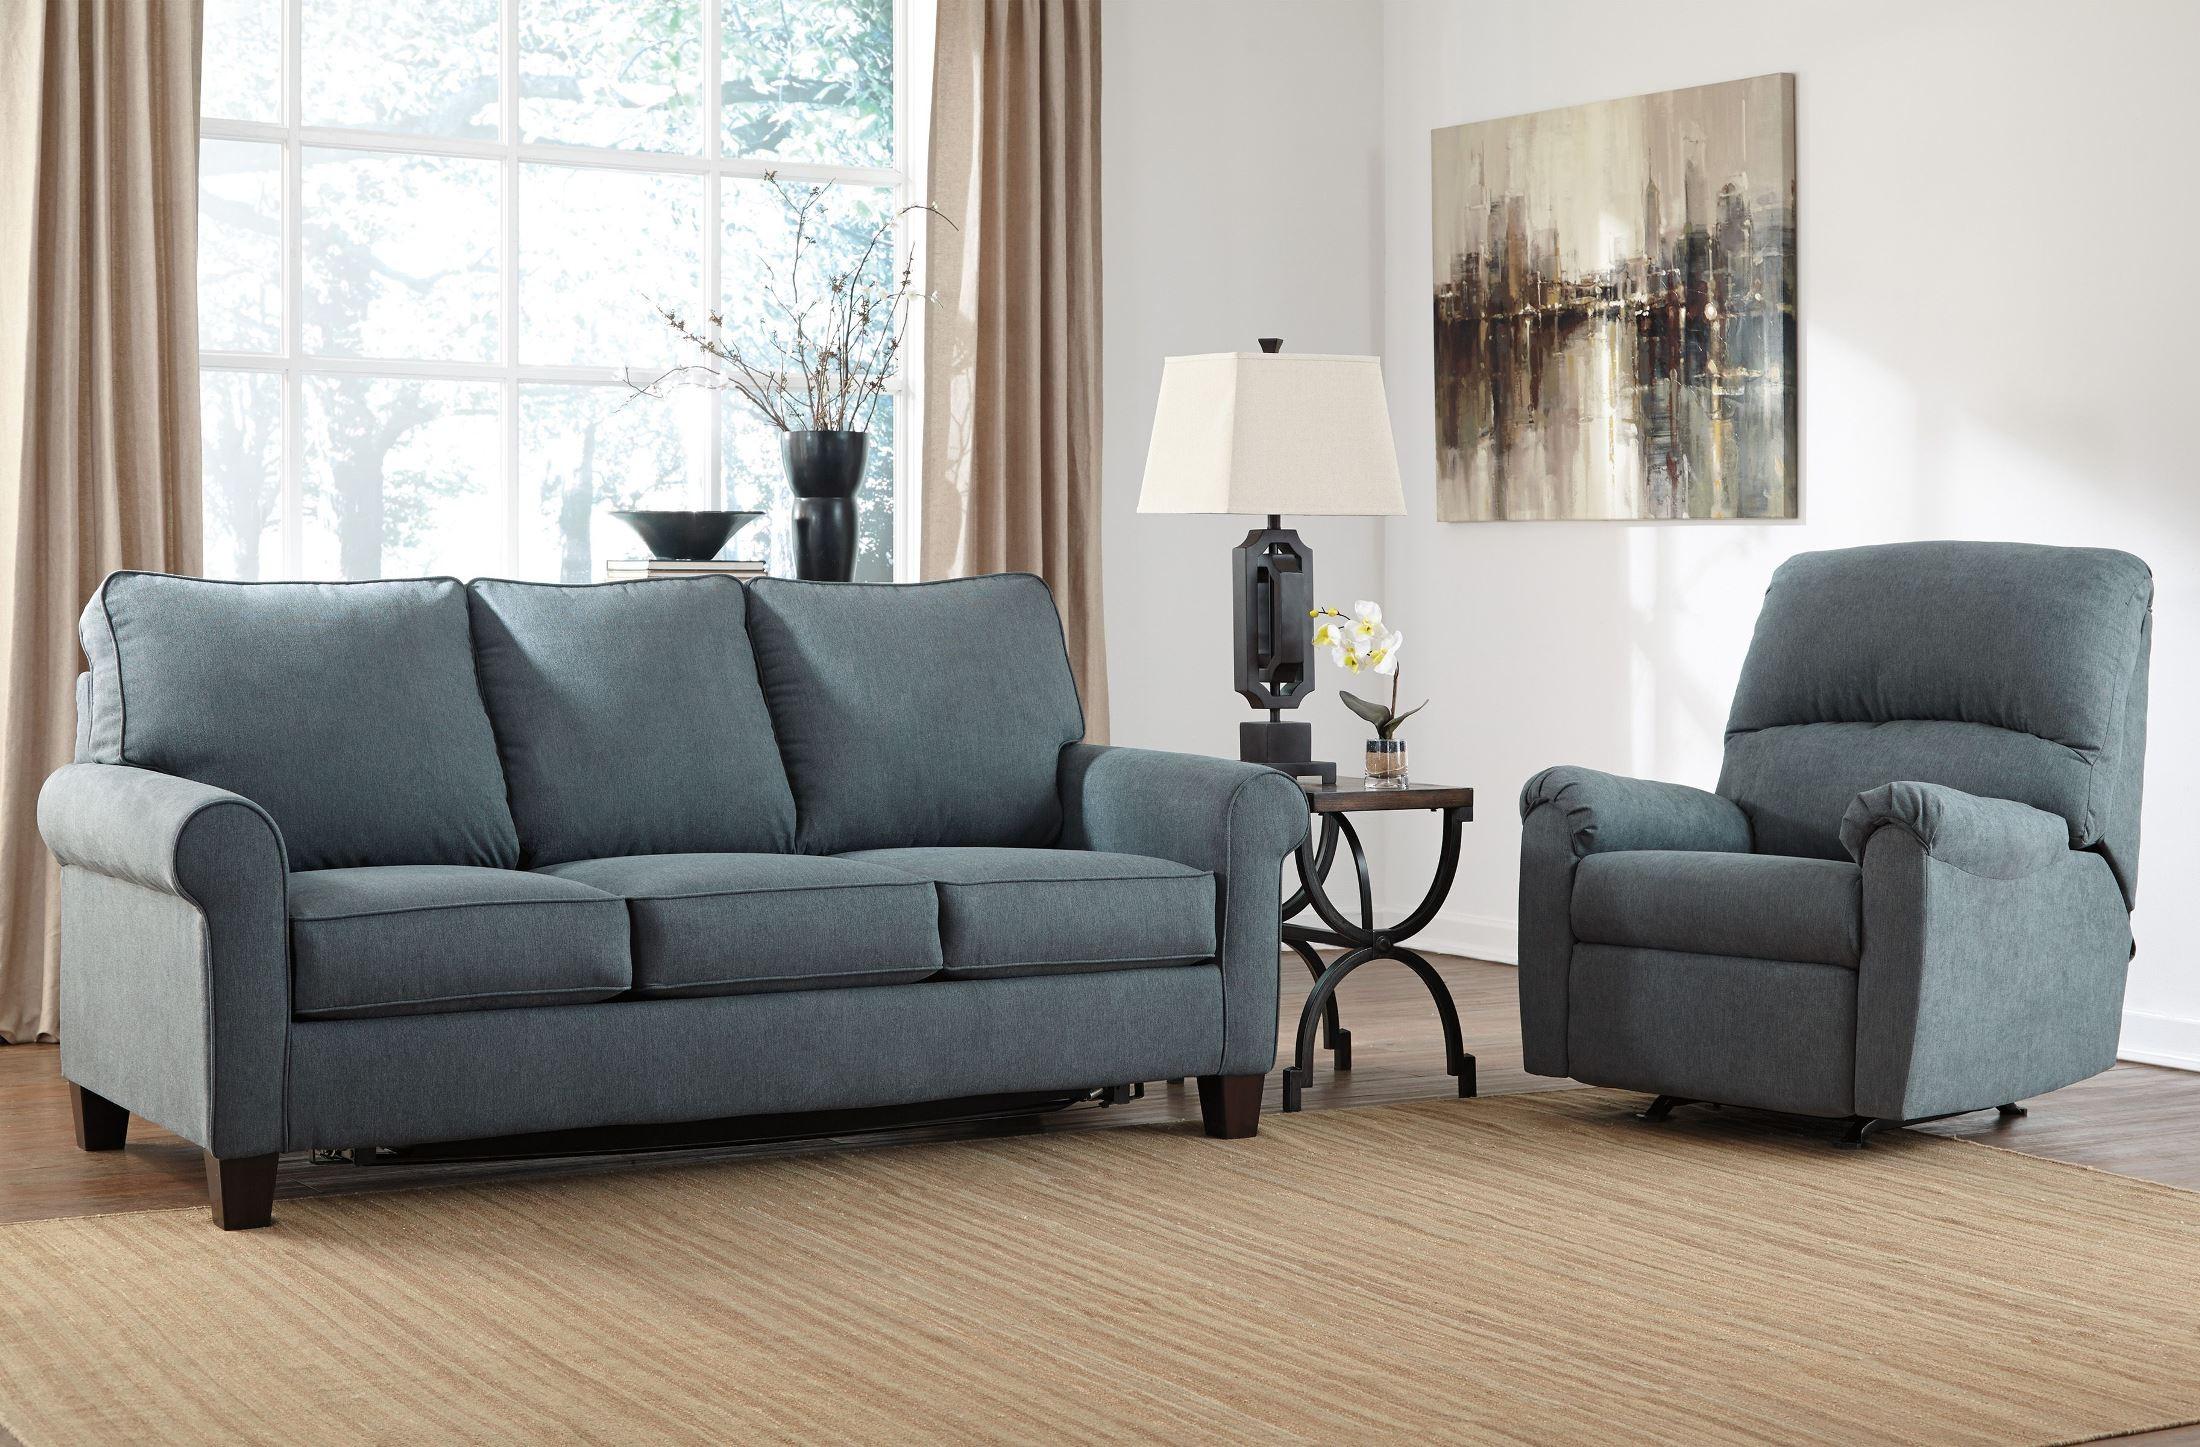 Zeth Denim Full Sofa Sleeper From Ashley 2710136